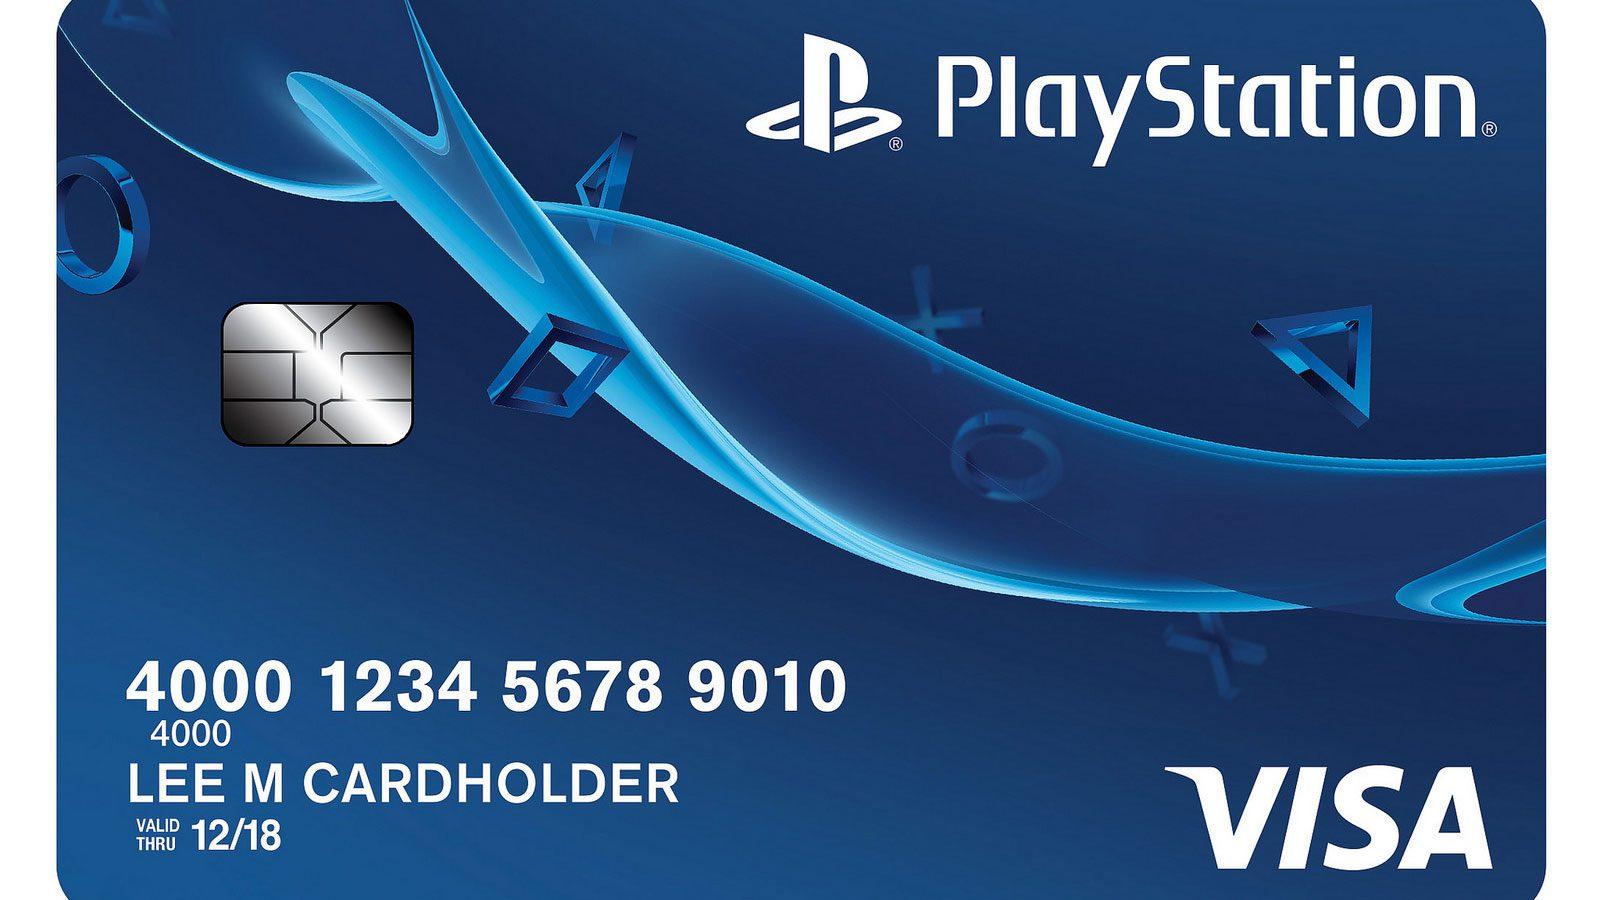 Introducing The New Playstation Credit Card Playstation Blog